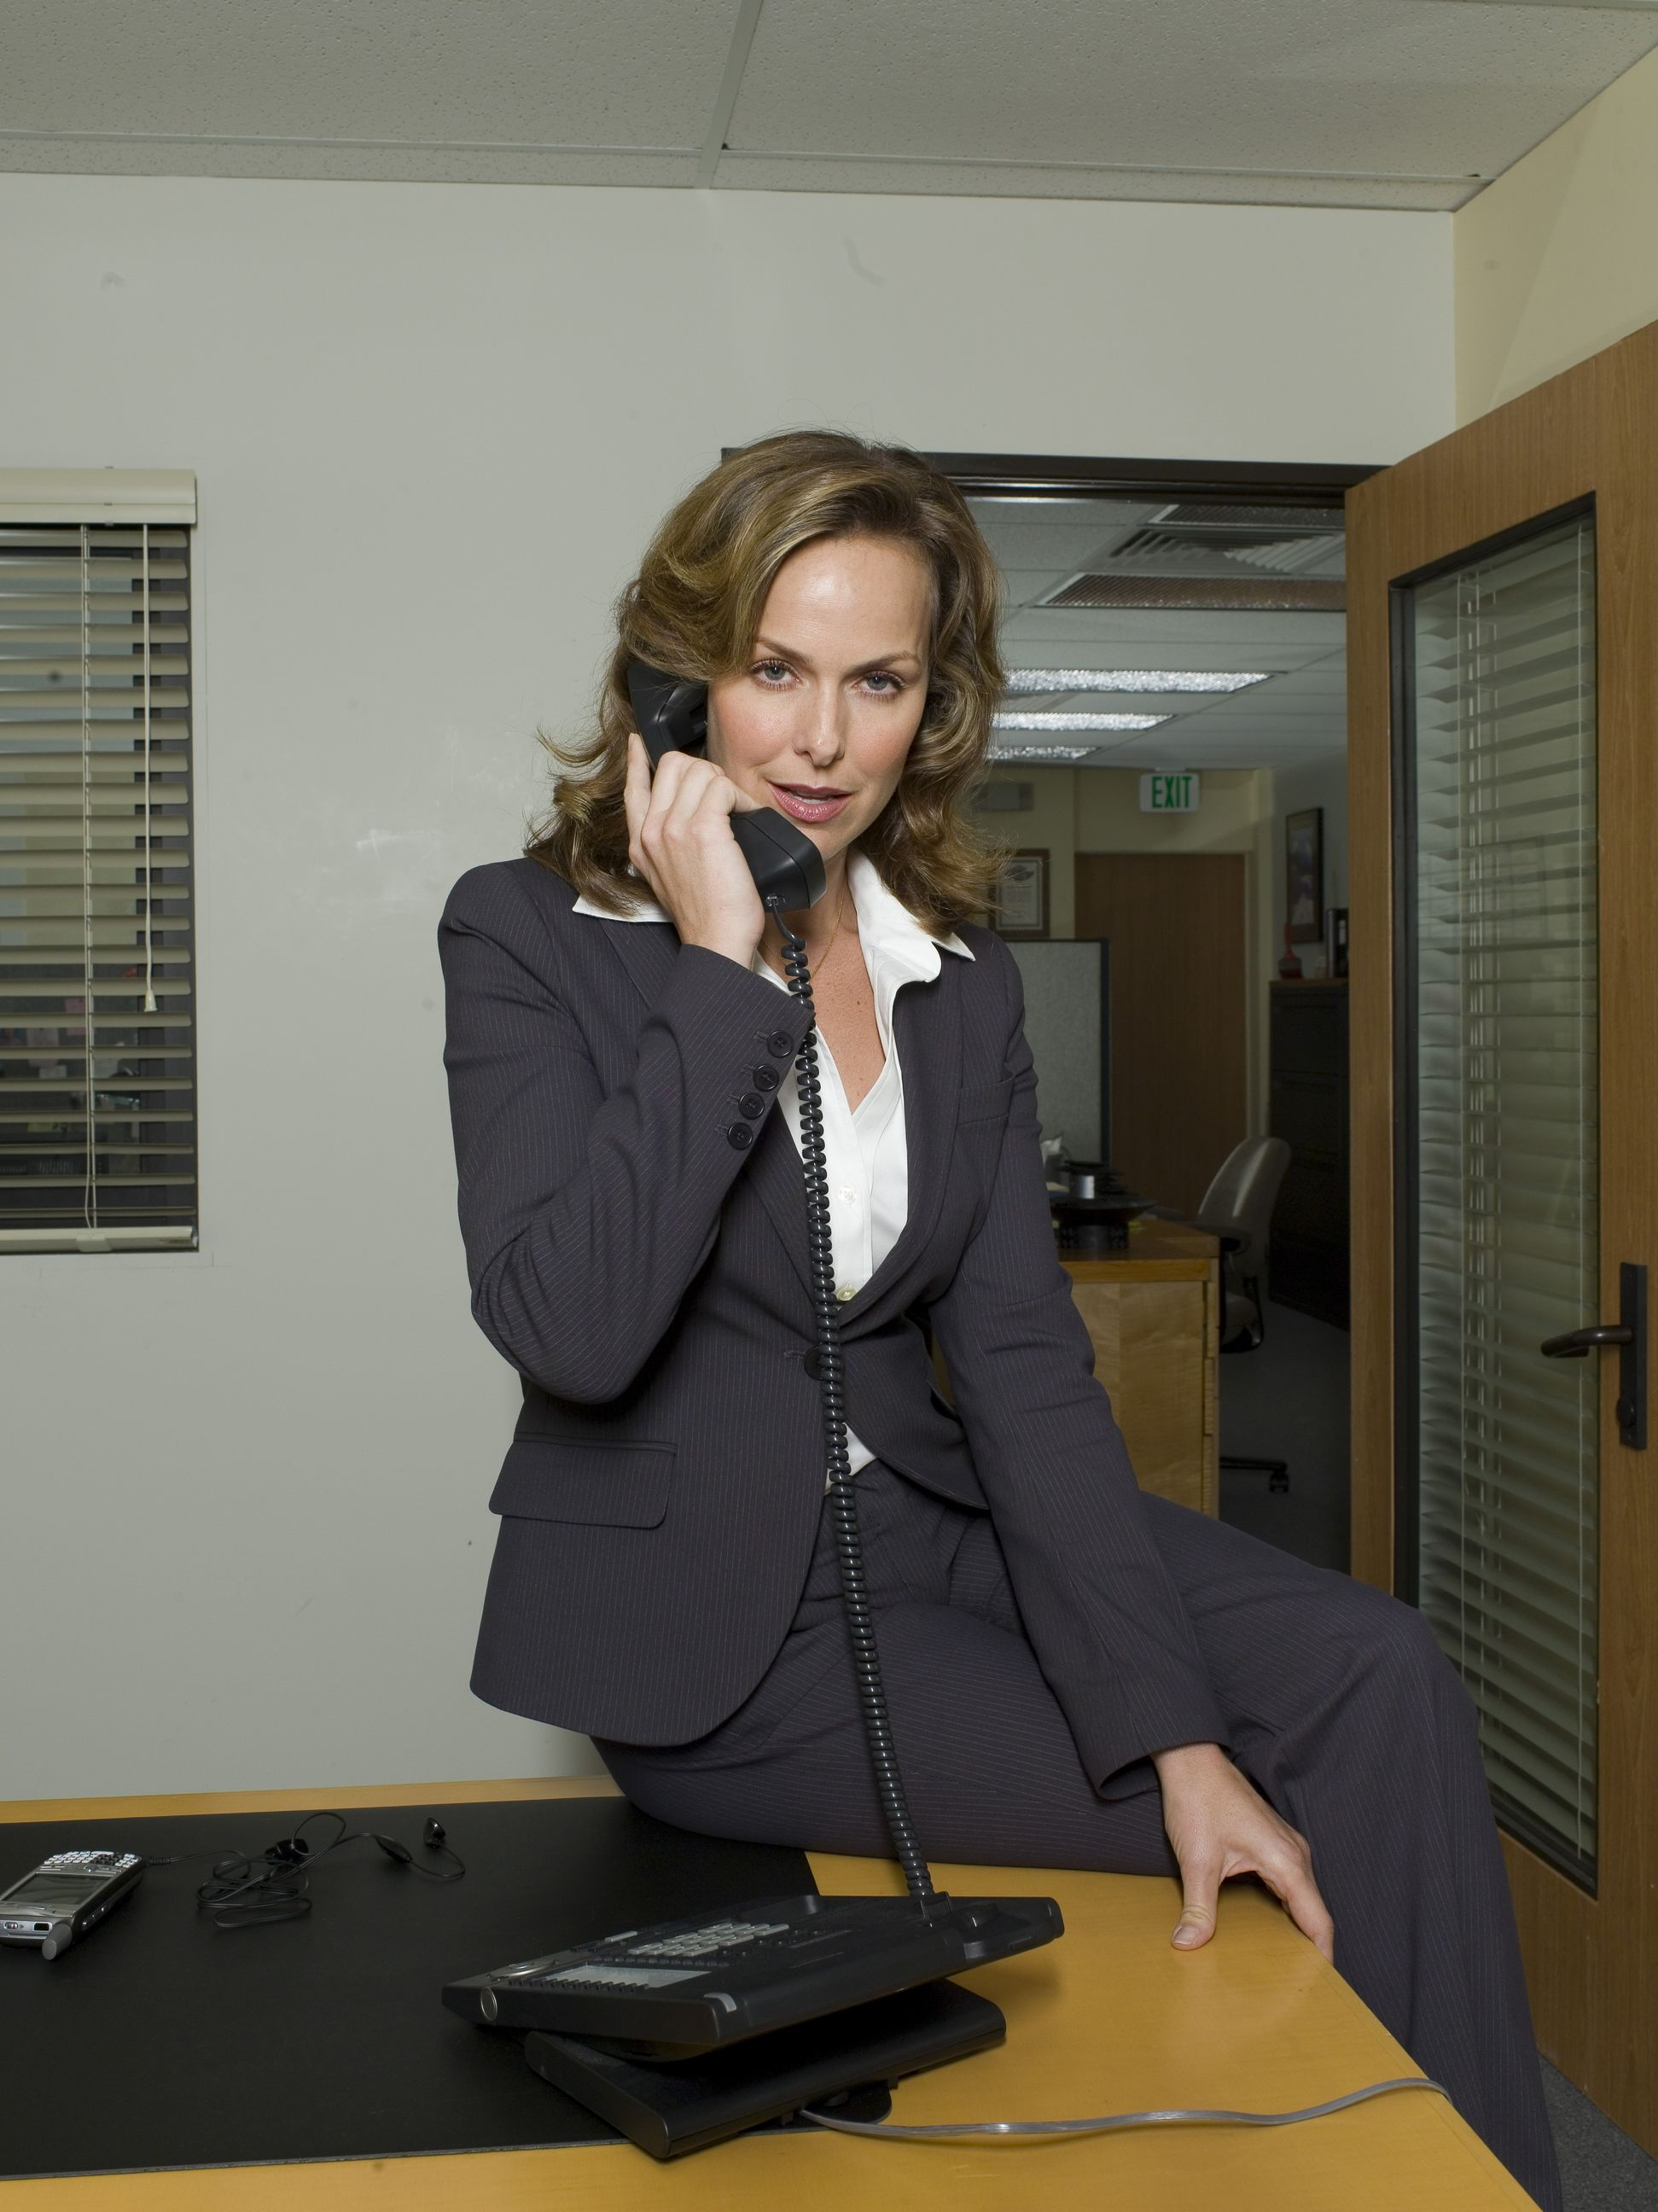 Secretary keeps job by performing sex